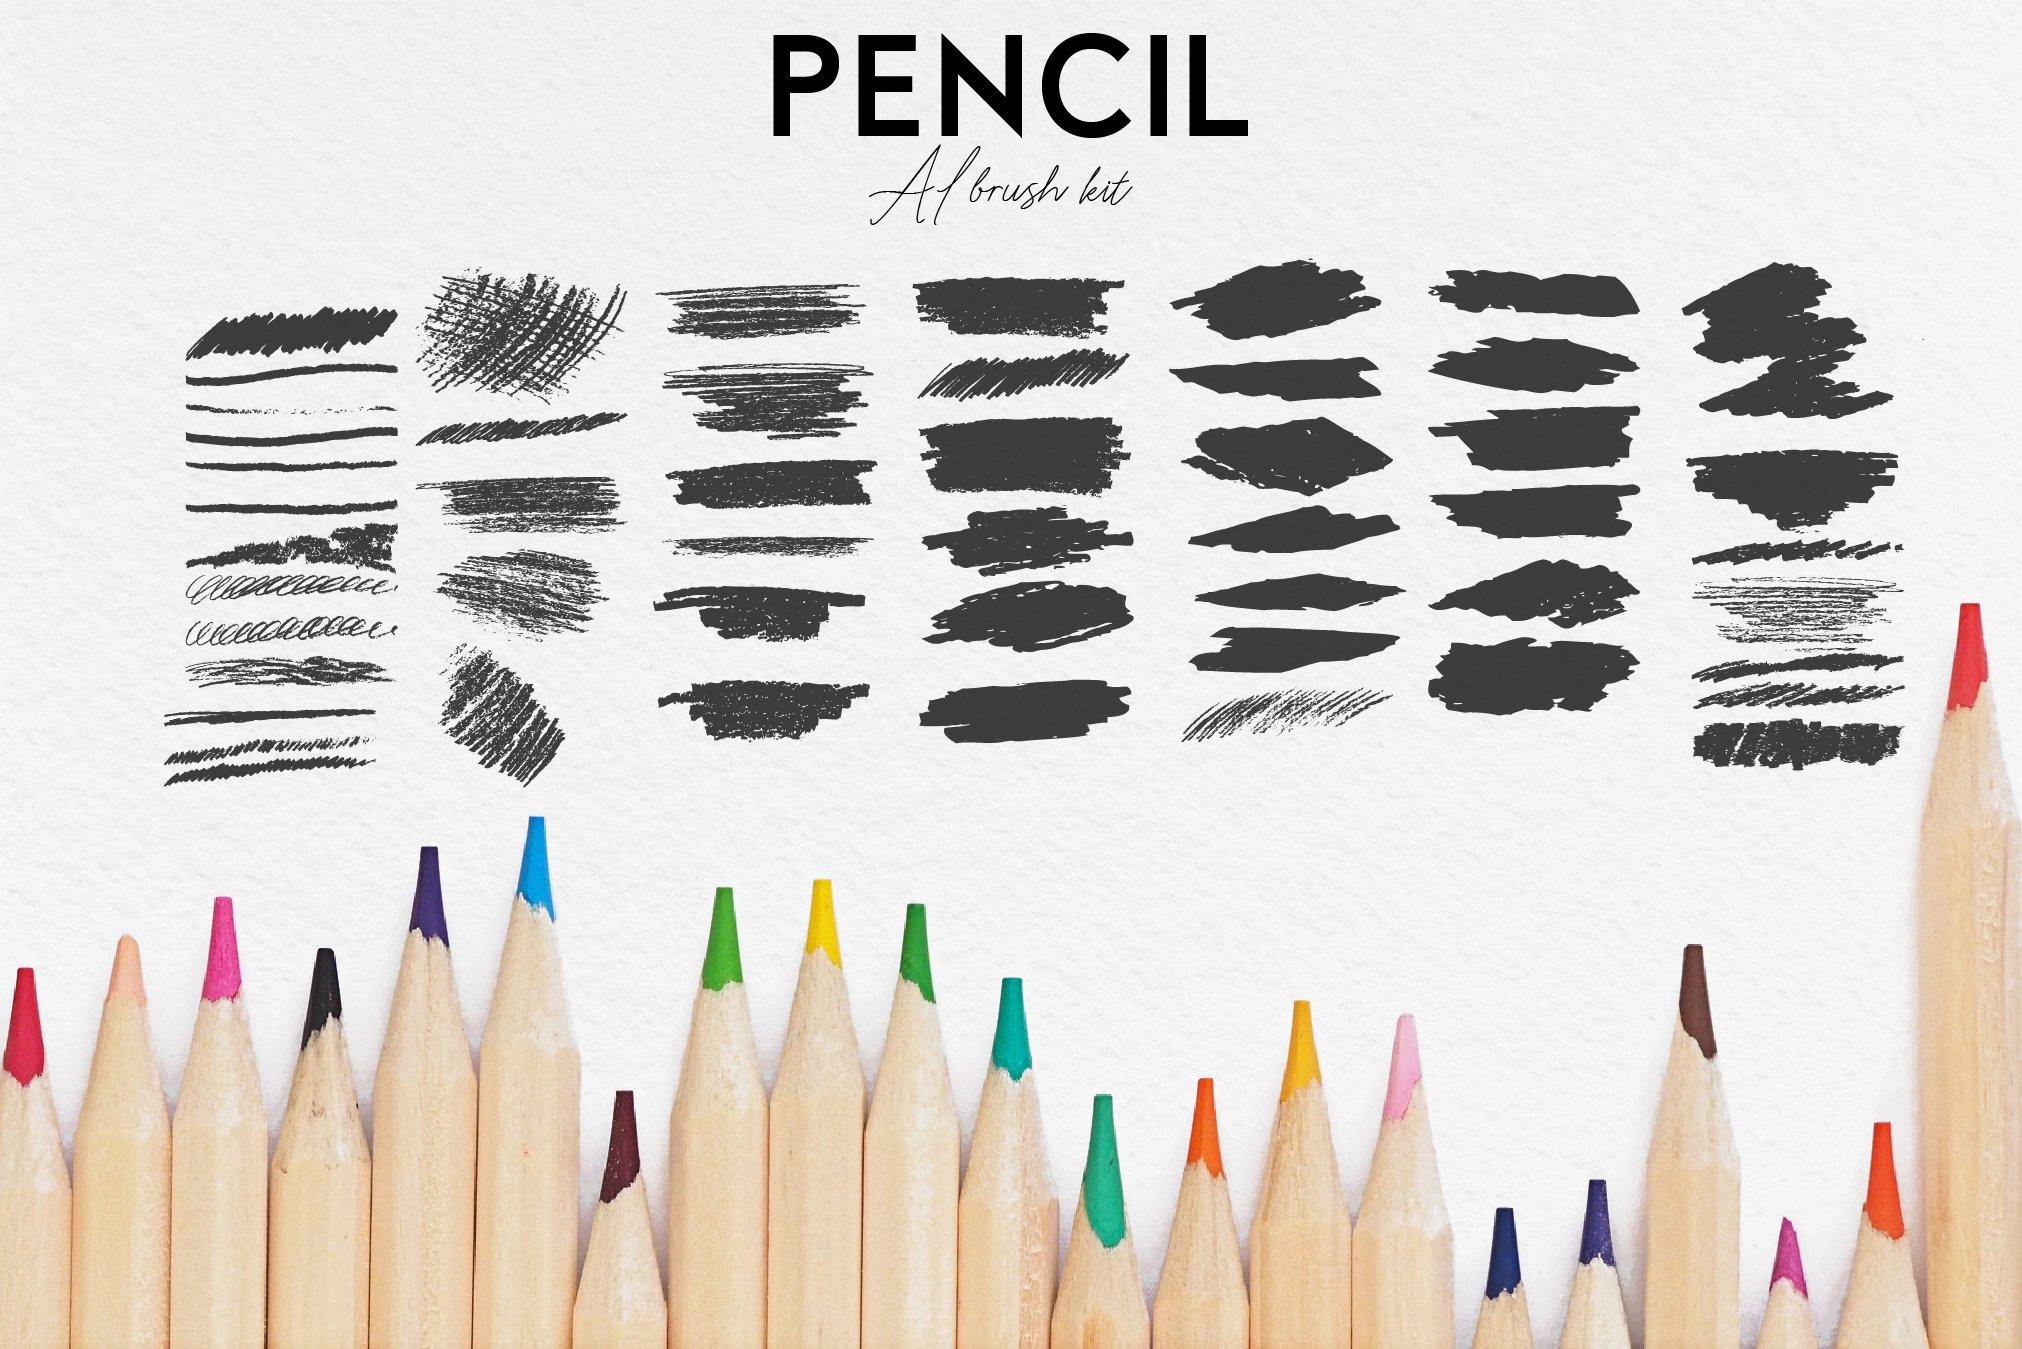 pencil promo3 01 3